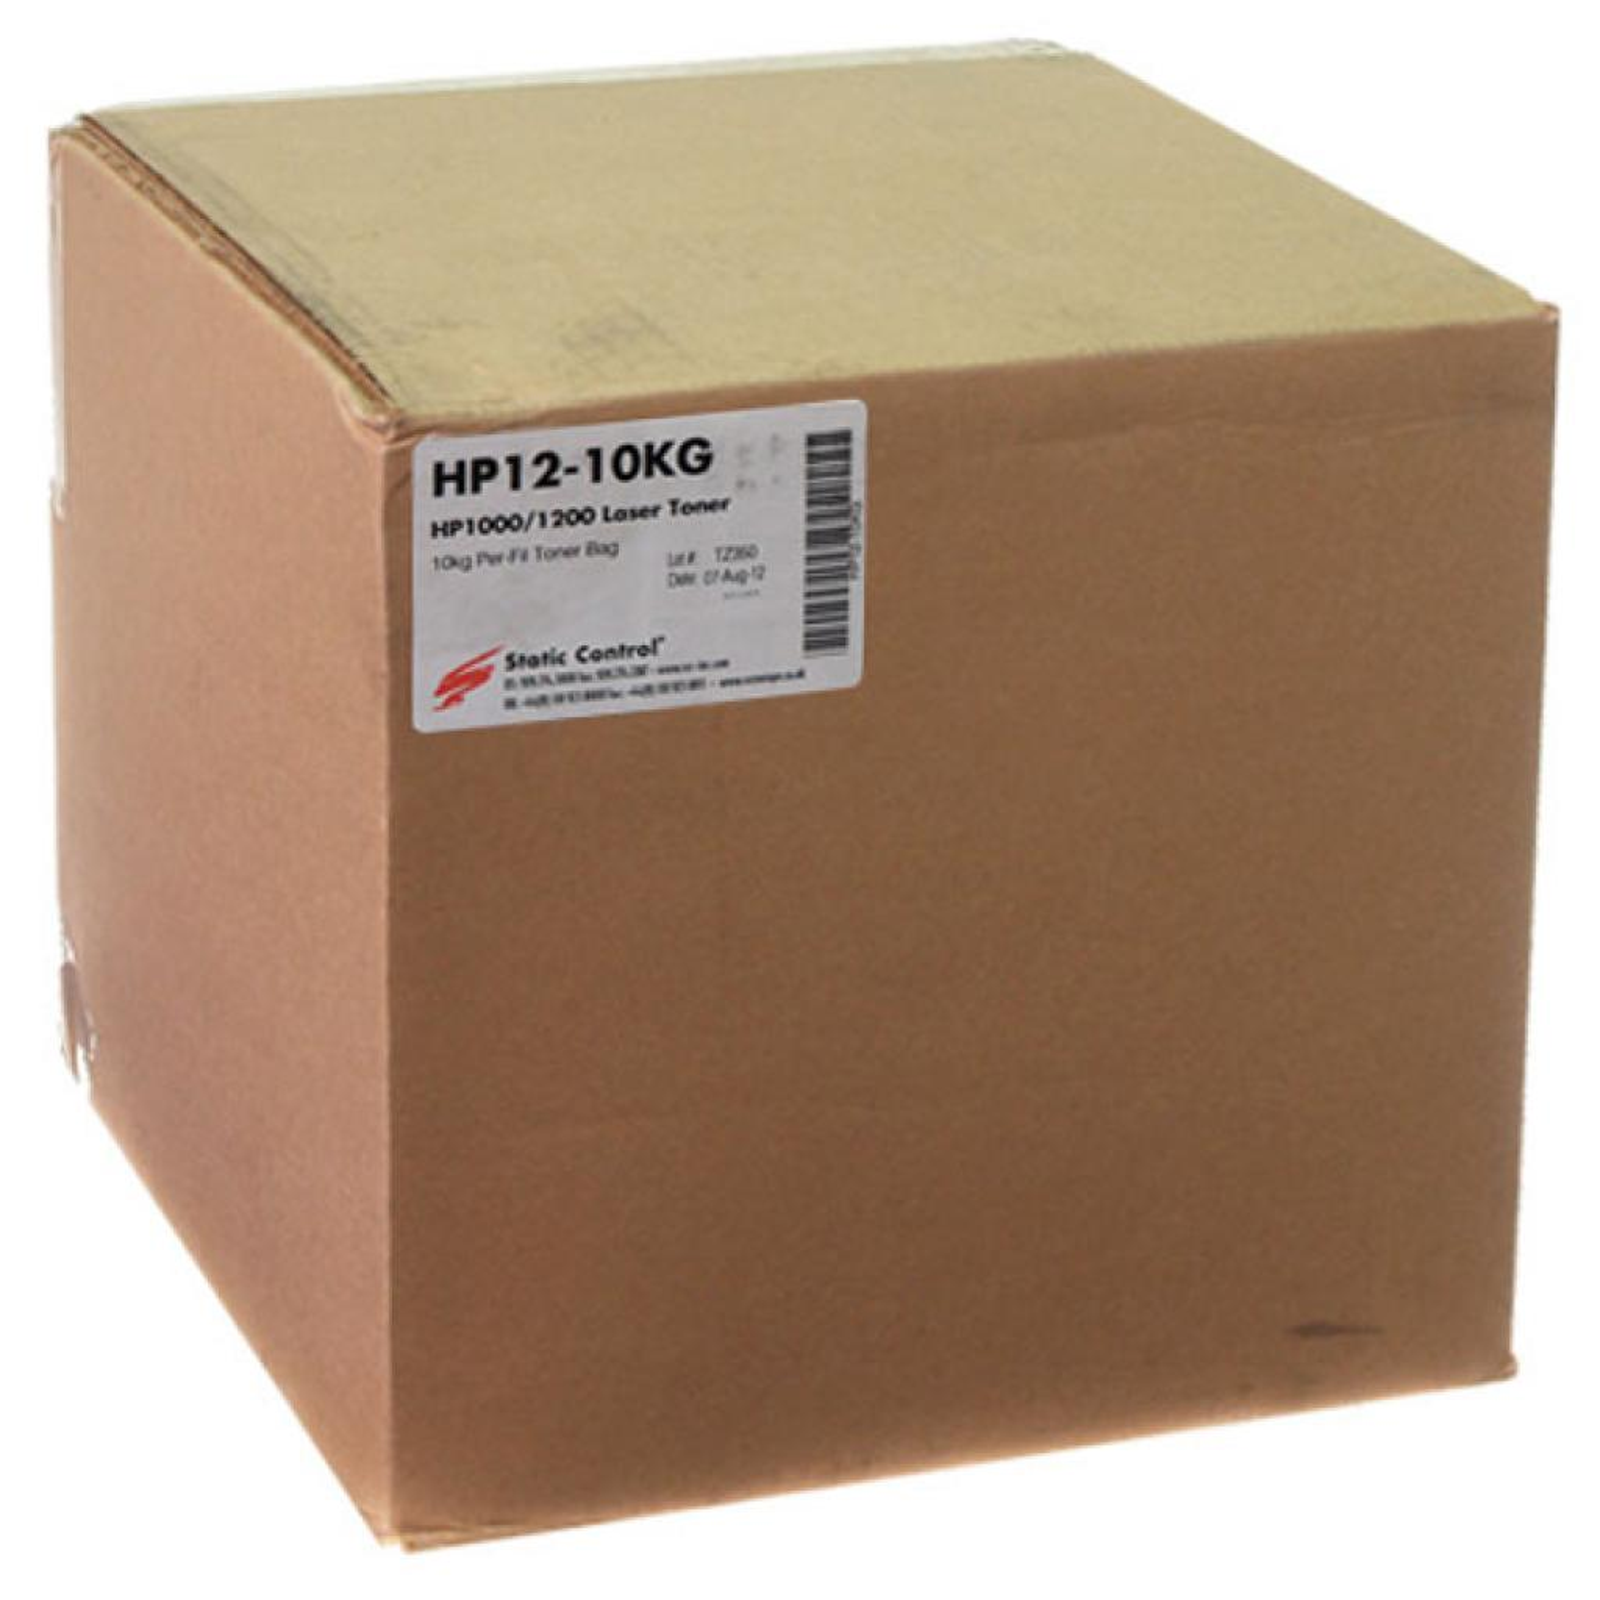 Тонер HP LJ1200/1000(C7115A) CanonEP25/27 Static Control (HP12-10KG)